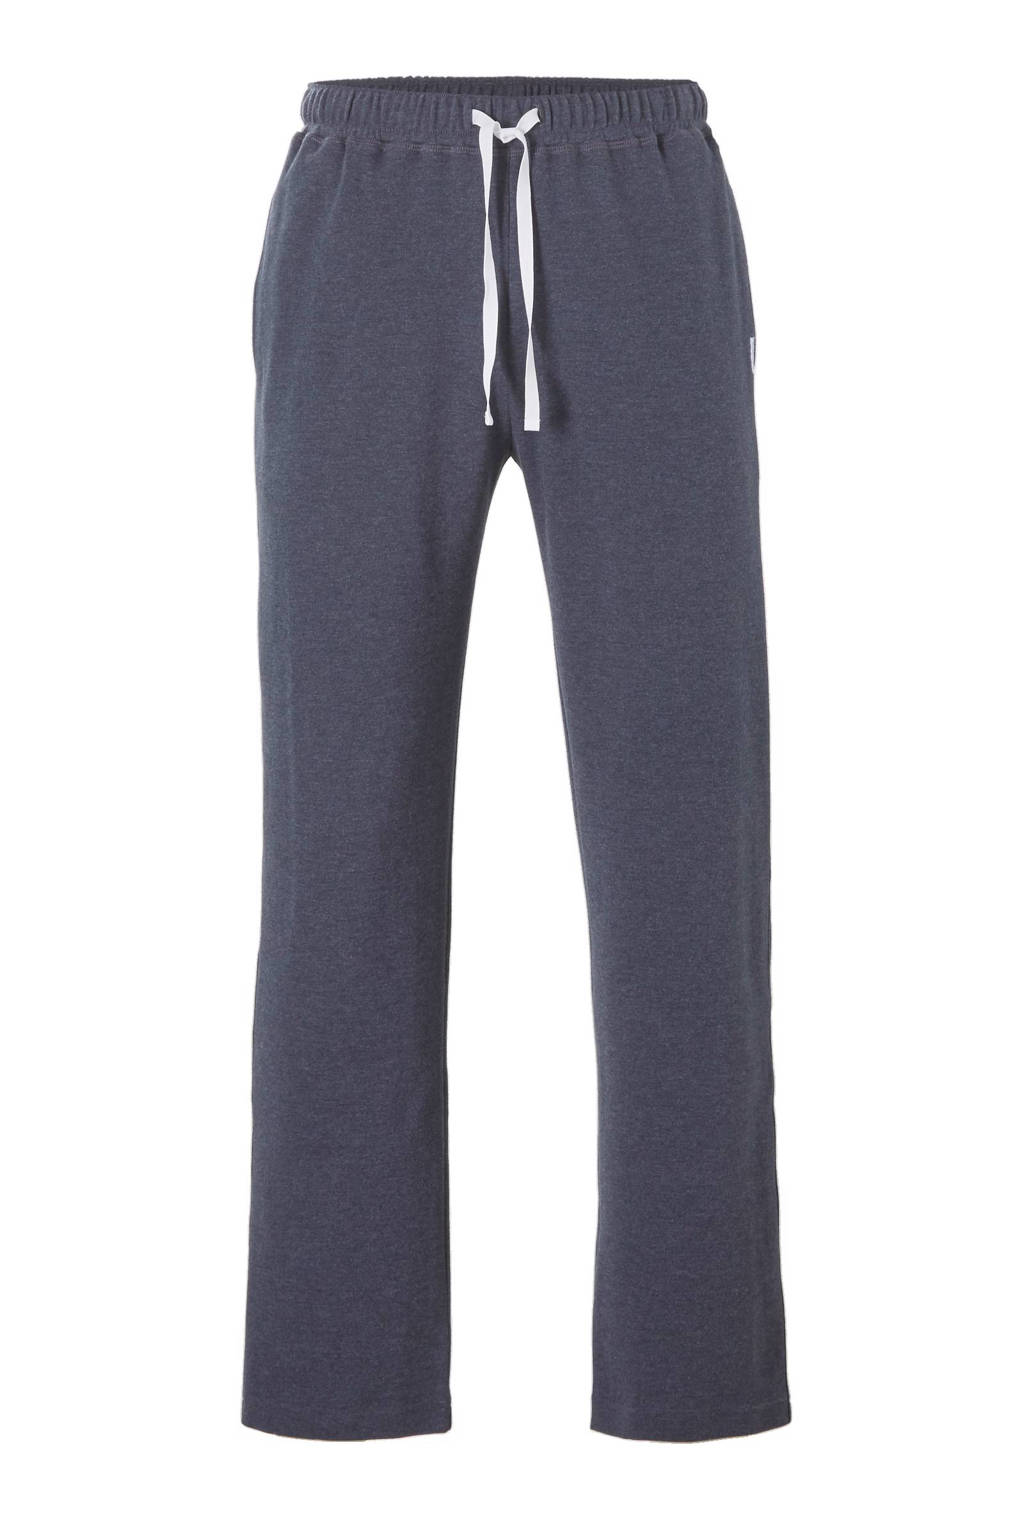 Ceceba +size pyjamabroek donkergrijs, Donkergrijs